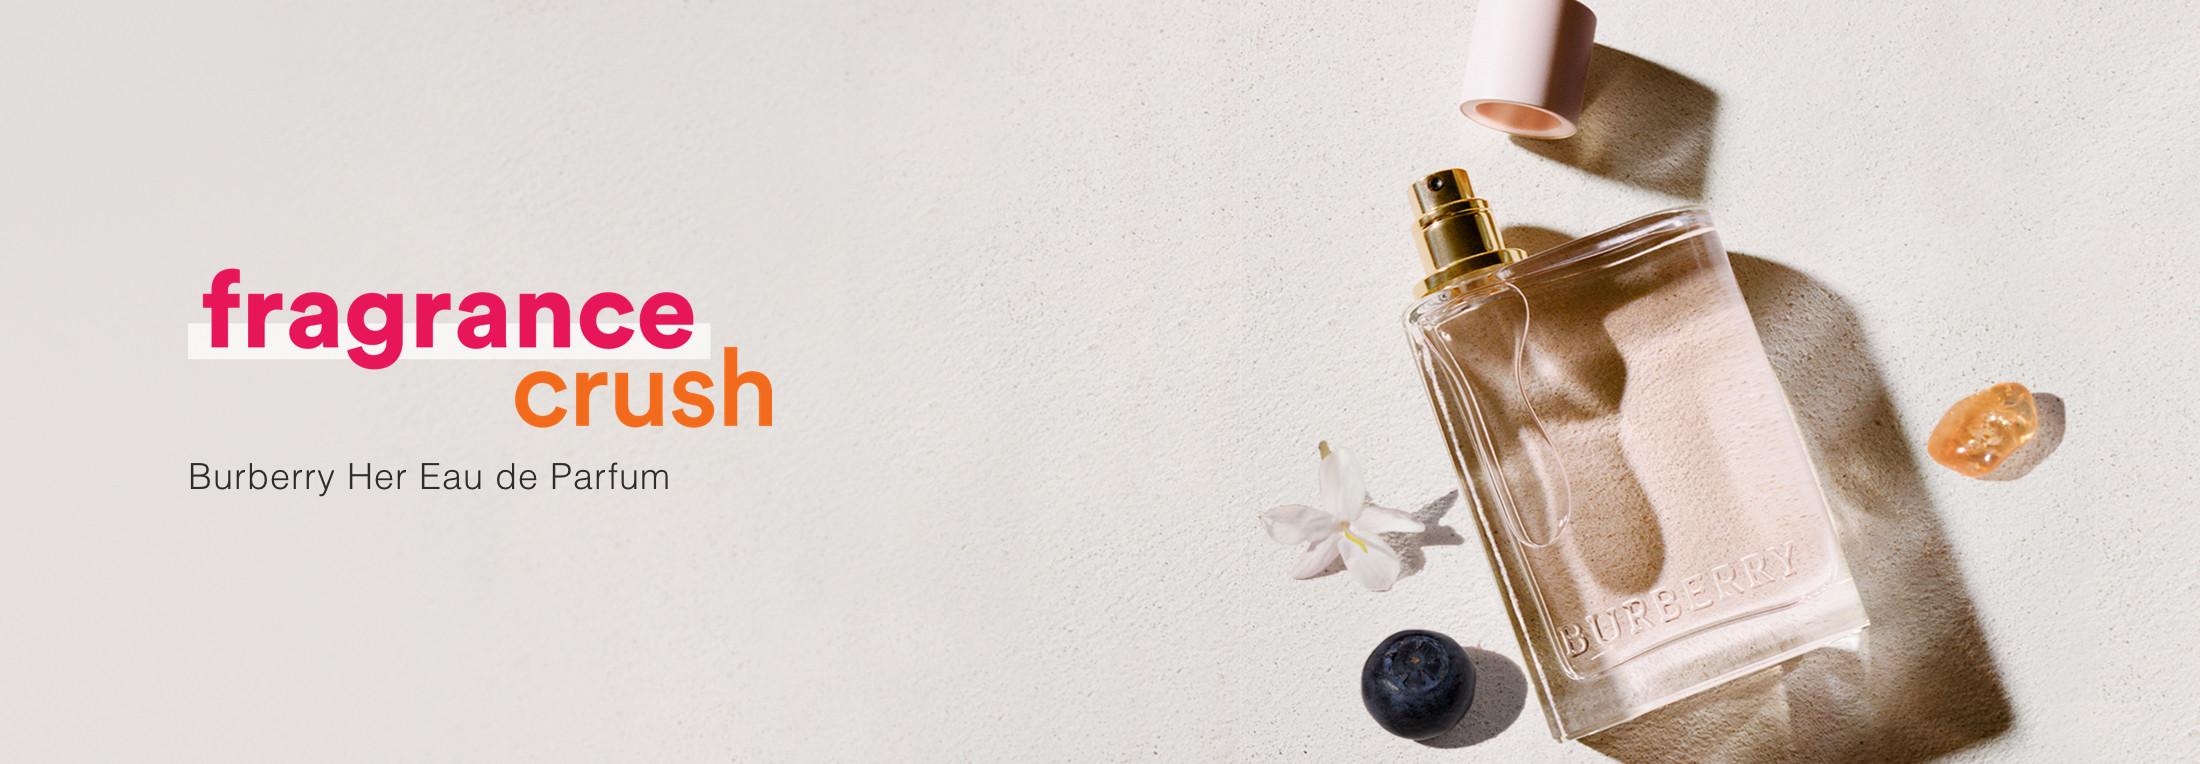 October Fragrance Crush at Ulta Beauty - Burberry Her Eau de Parfum